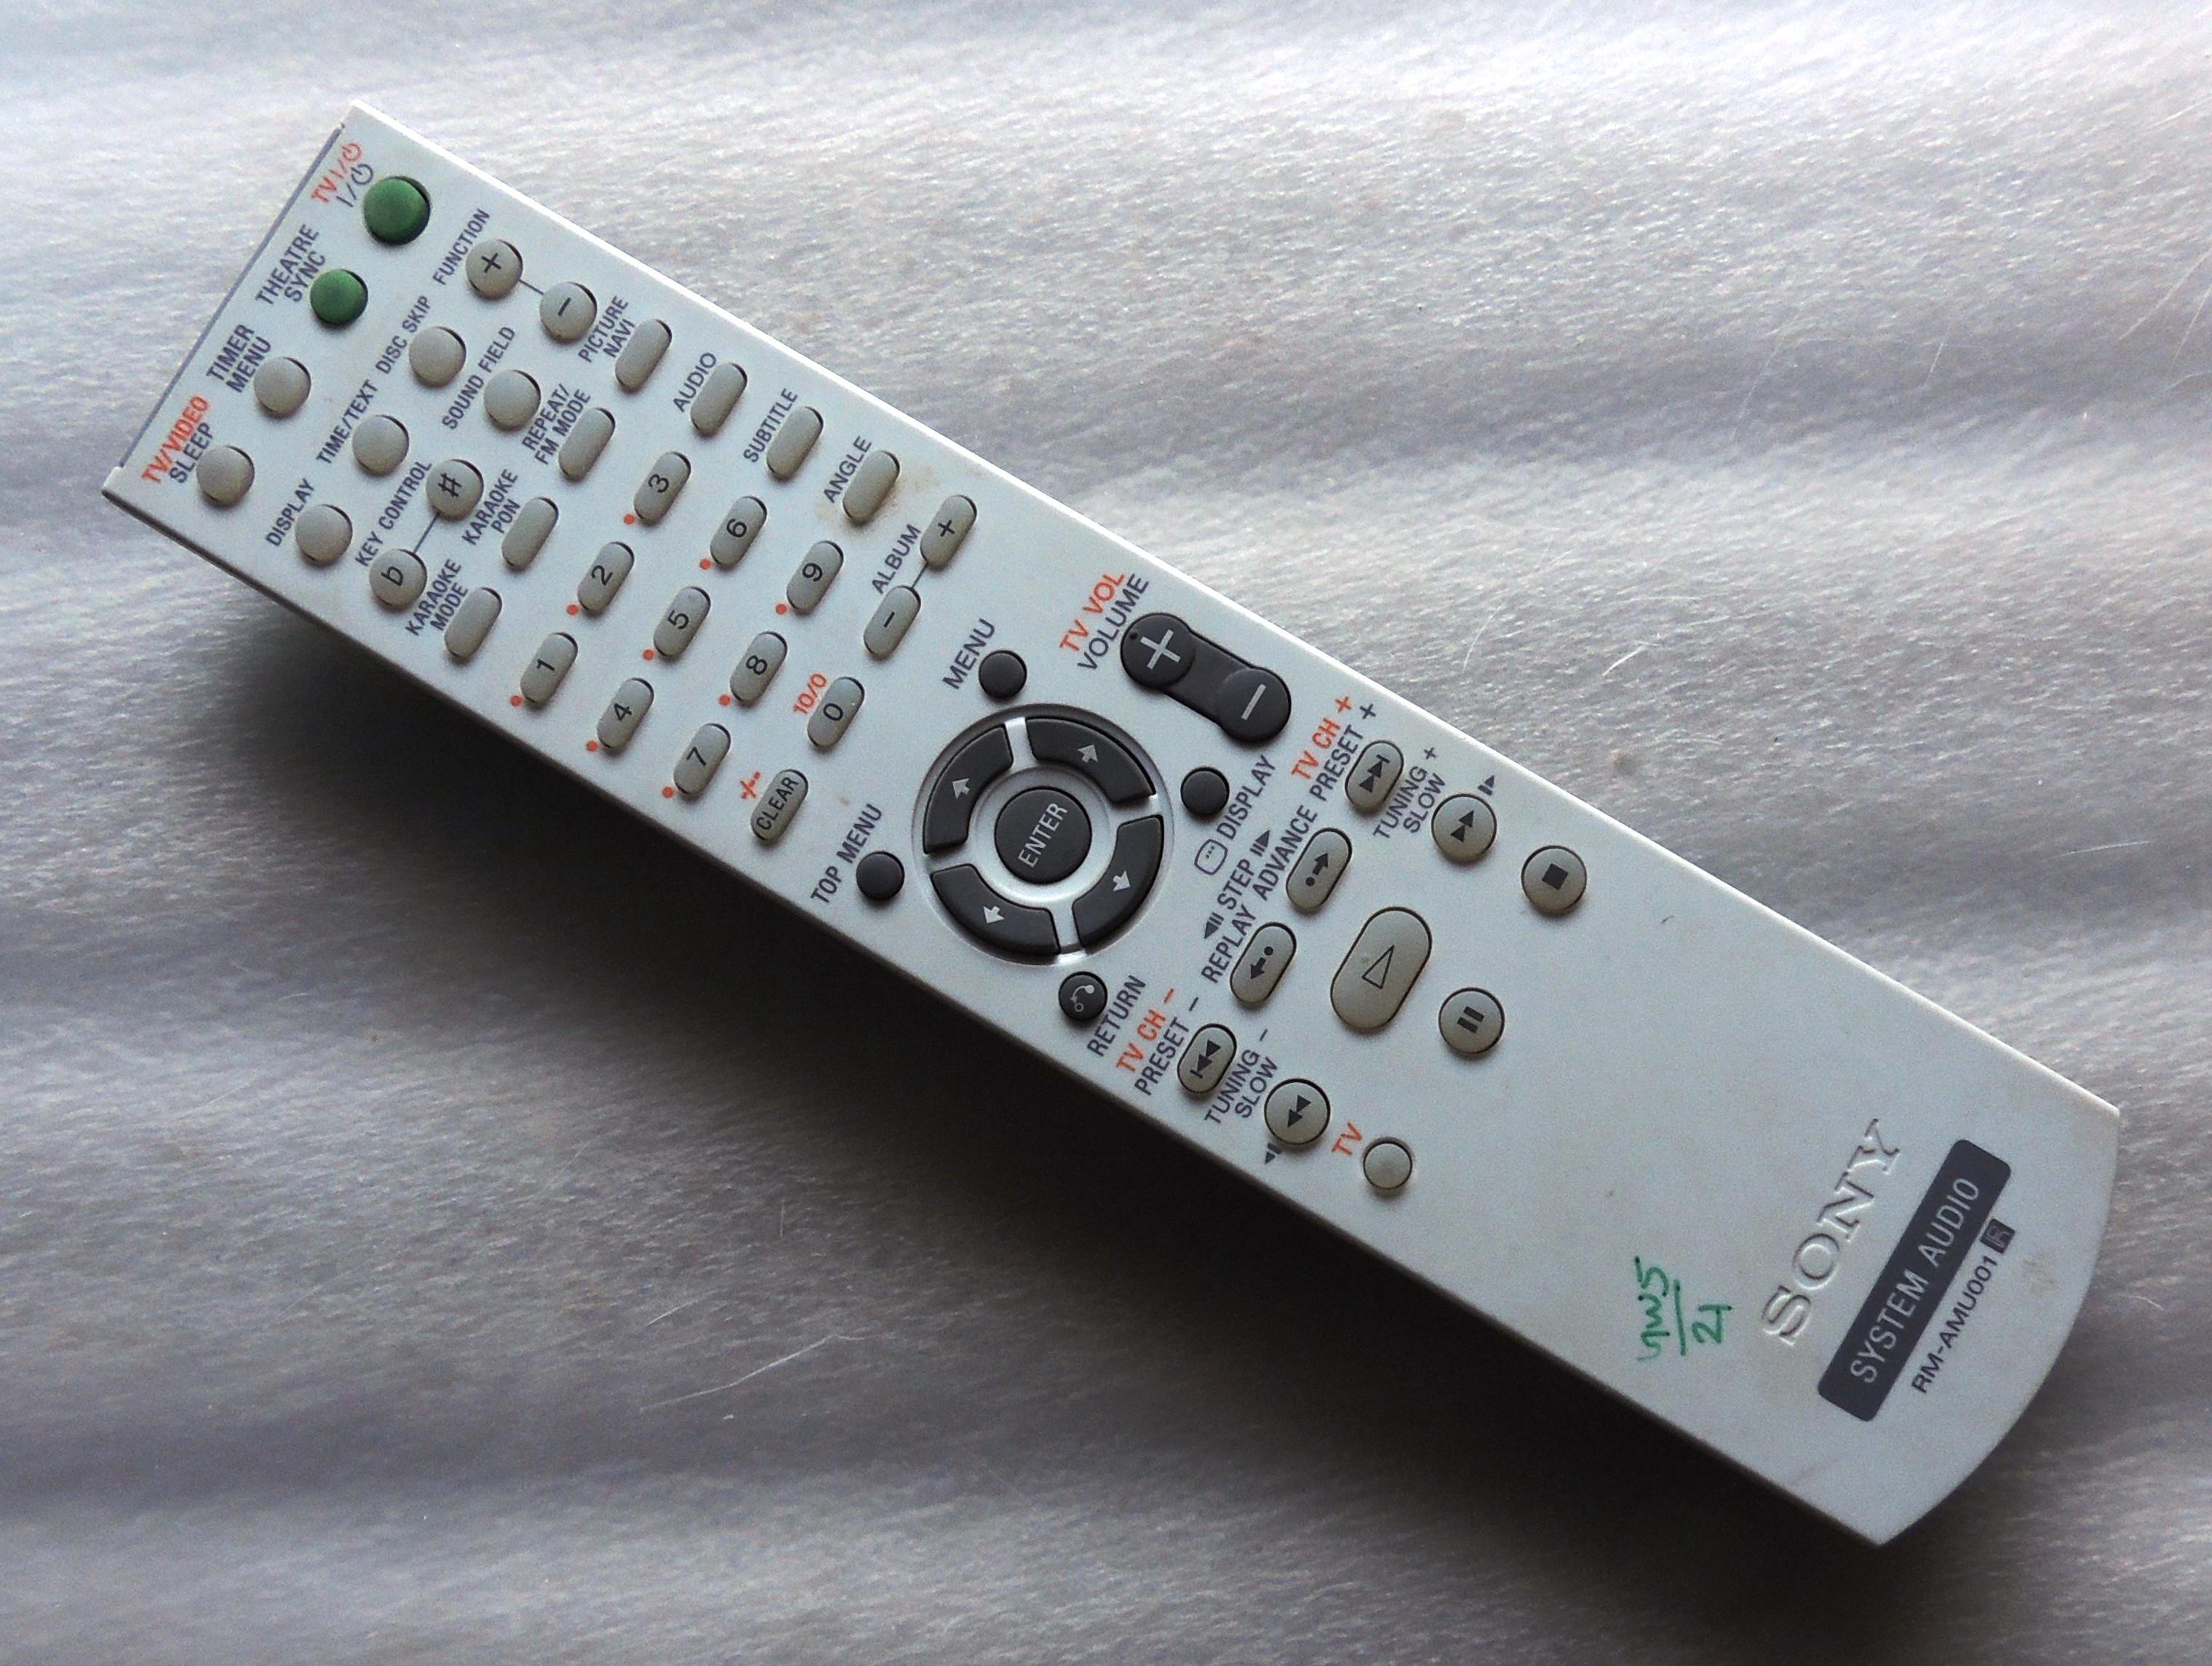 Remote Unit Sony DVD Player Archives - NarayaniTech.com